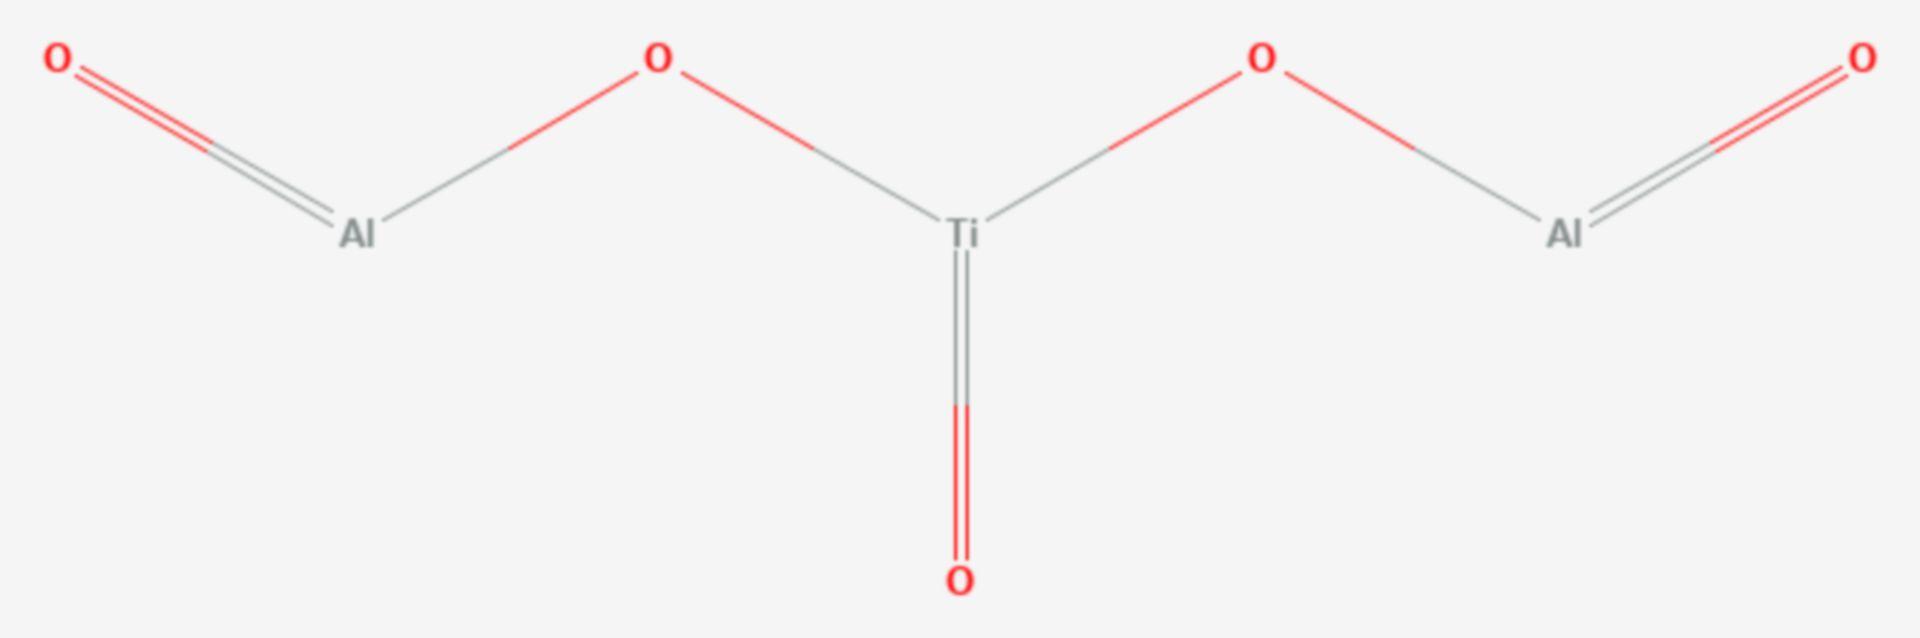 Aluminiumtitanat (Strukturformel)